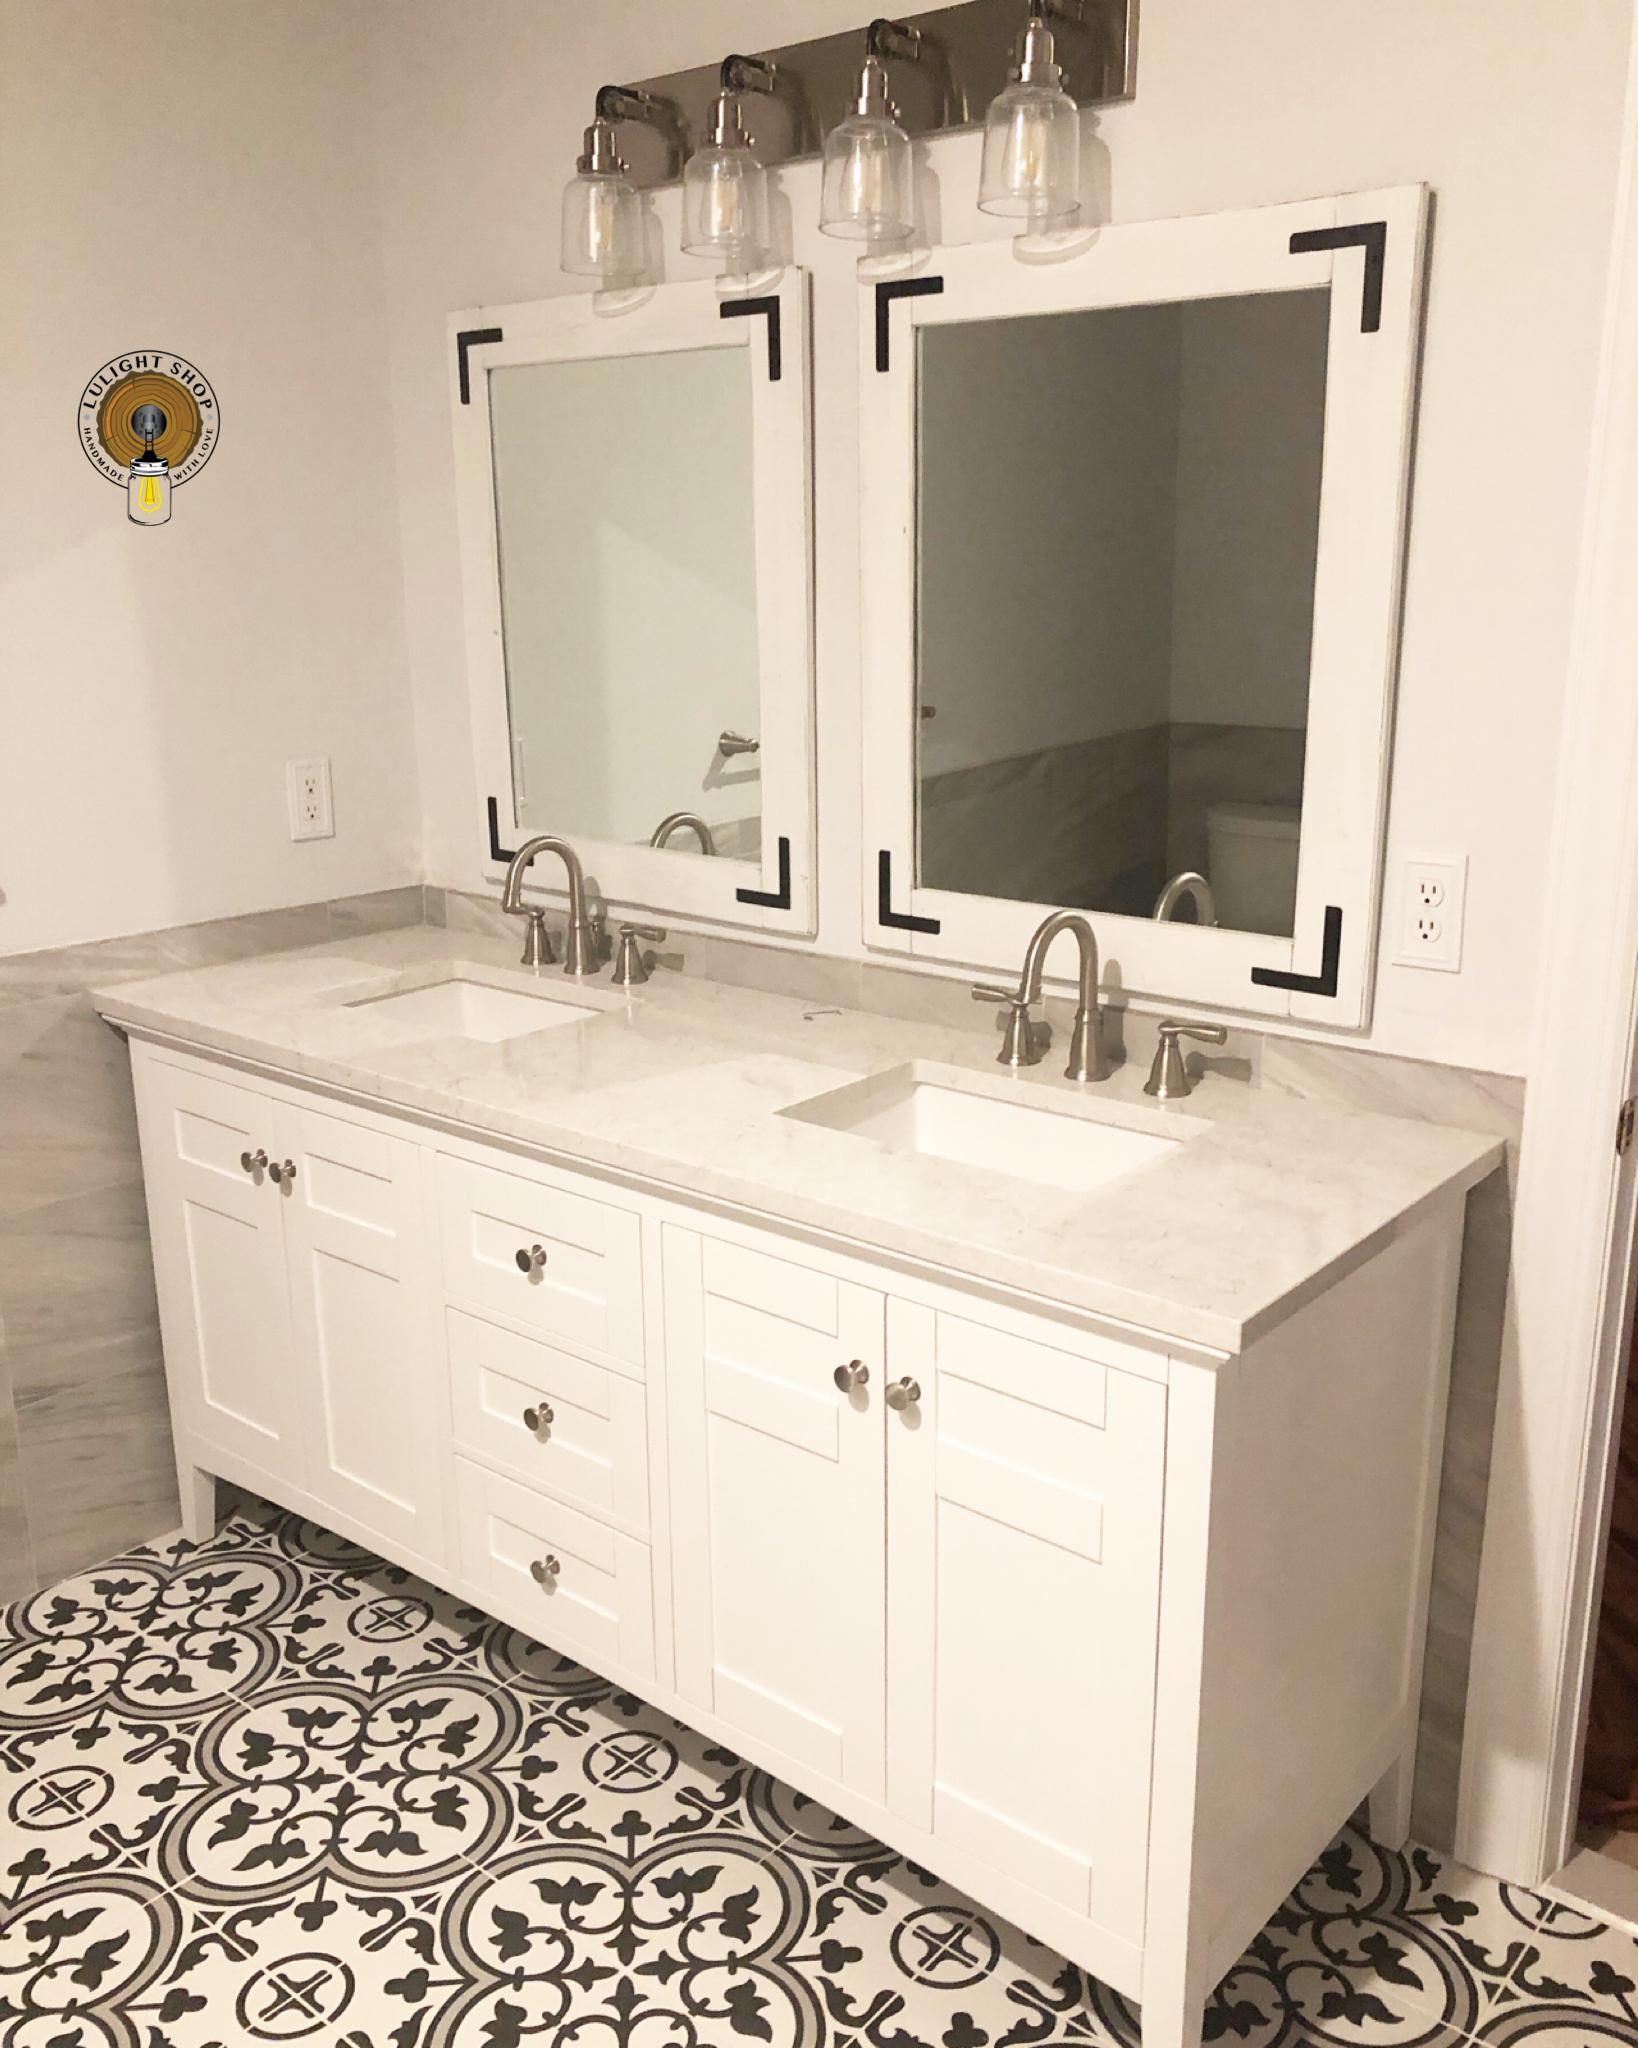 Handmade Whitewash Mirrors By Lulight Shop Wood Mirror Bathroom Industrial Style Bathroom Wood Framed Mirror